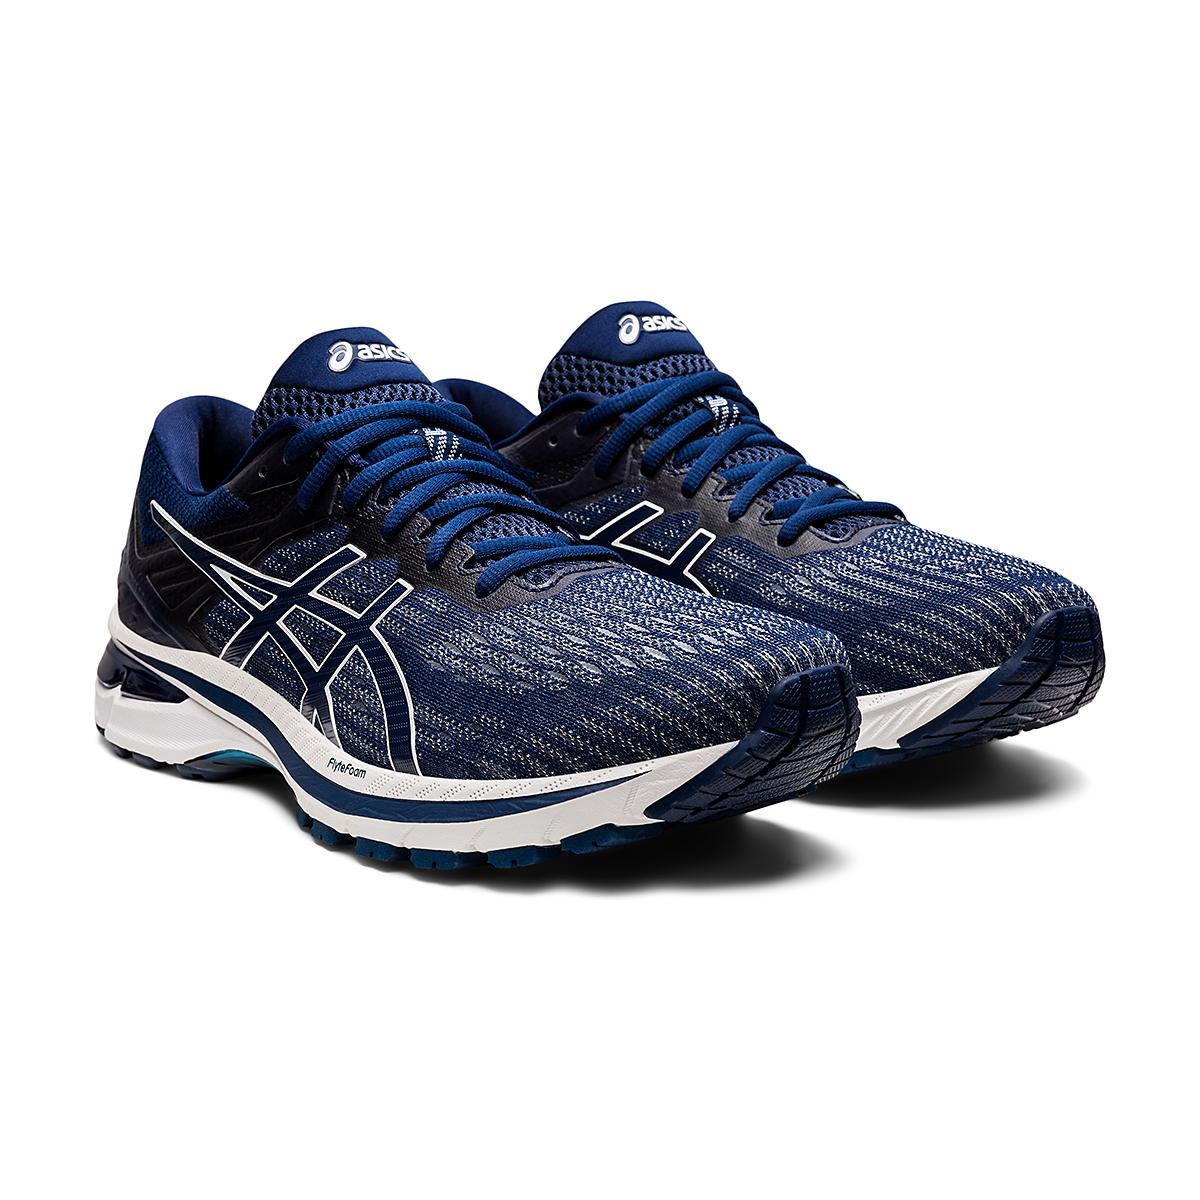 Men's Asics GT-2000 9 Running Shoe - Color: Blue Expanse - Size: 6 - Width: Regular, Blue Expanse, large, image 3